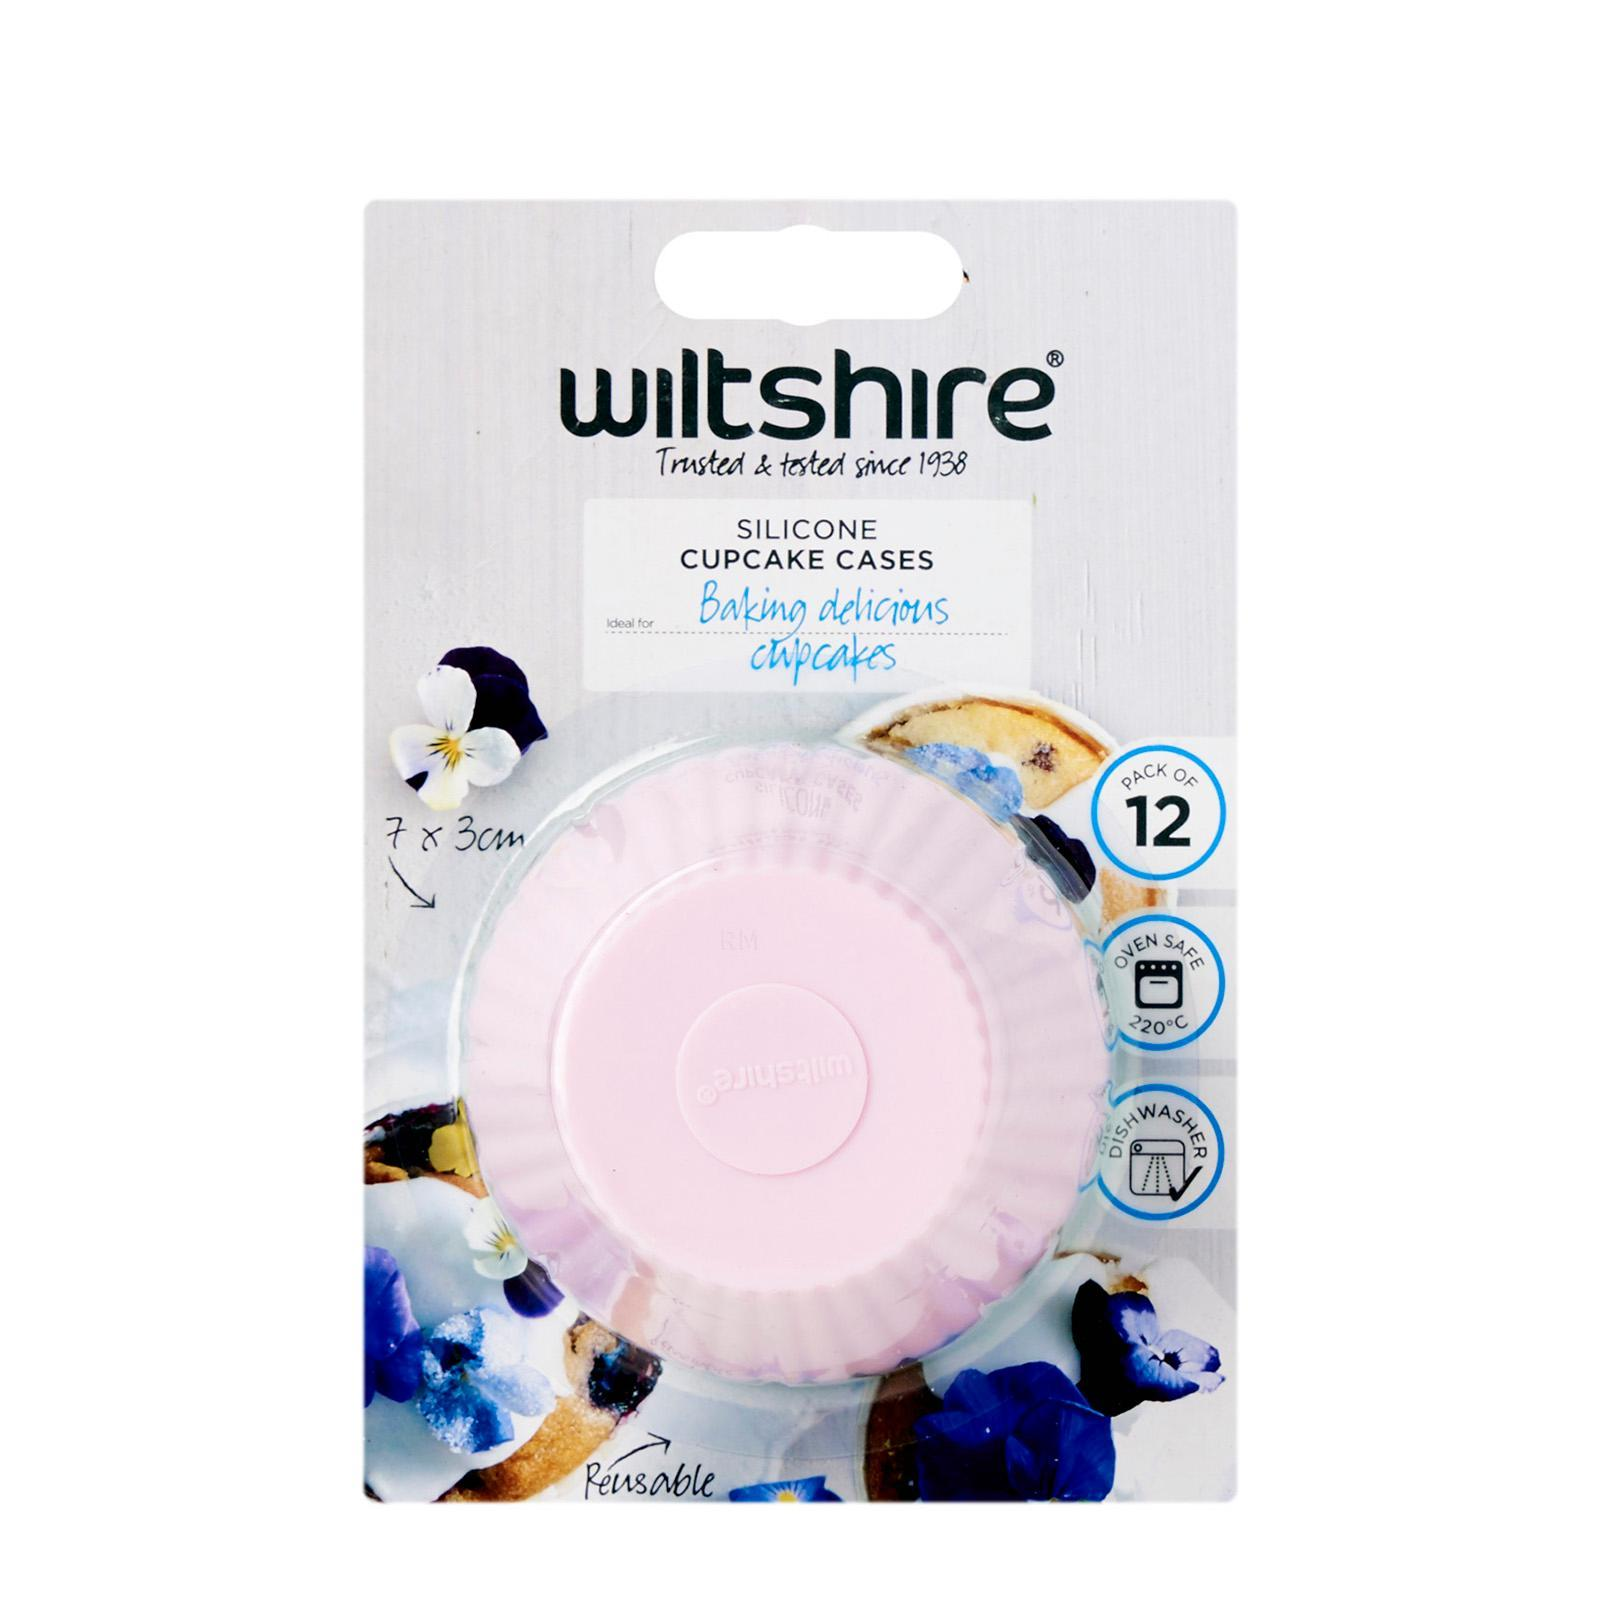 Wiltshire Silicone Cupcake Cases